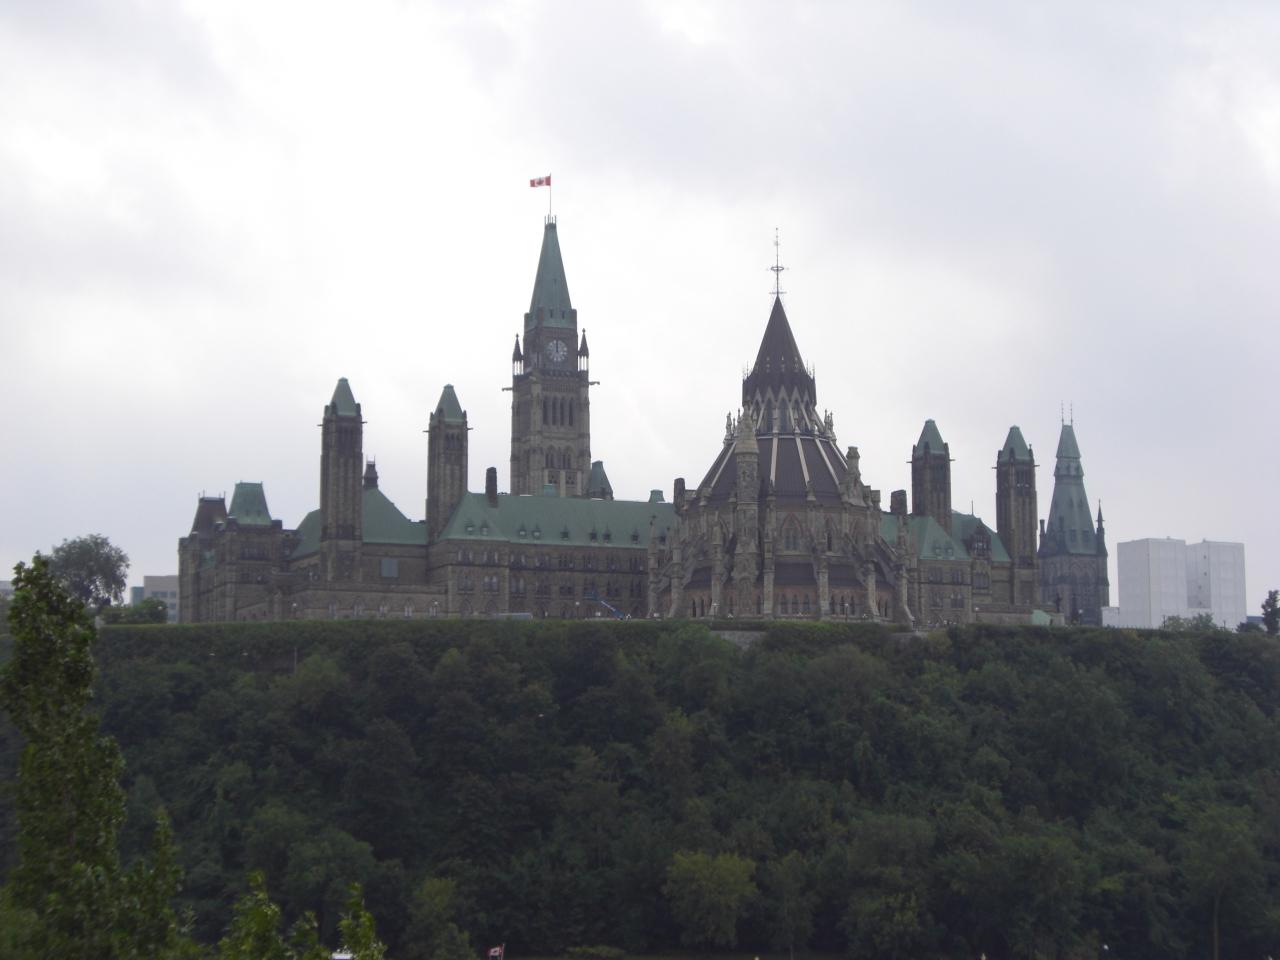 Parlament mit Bibliothek